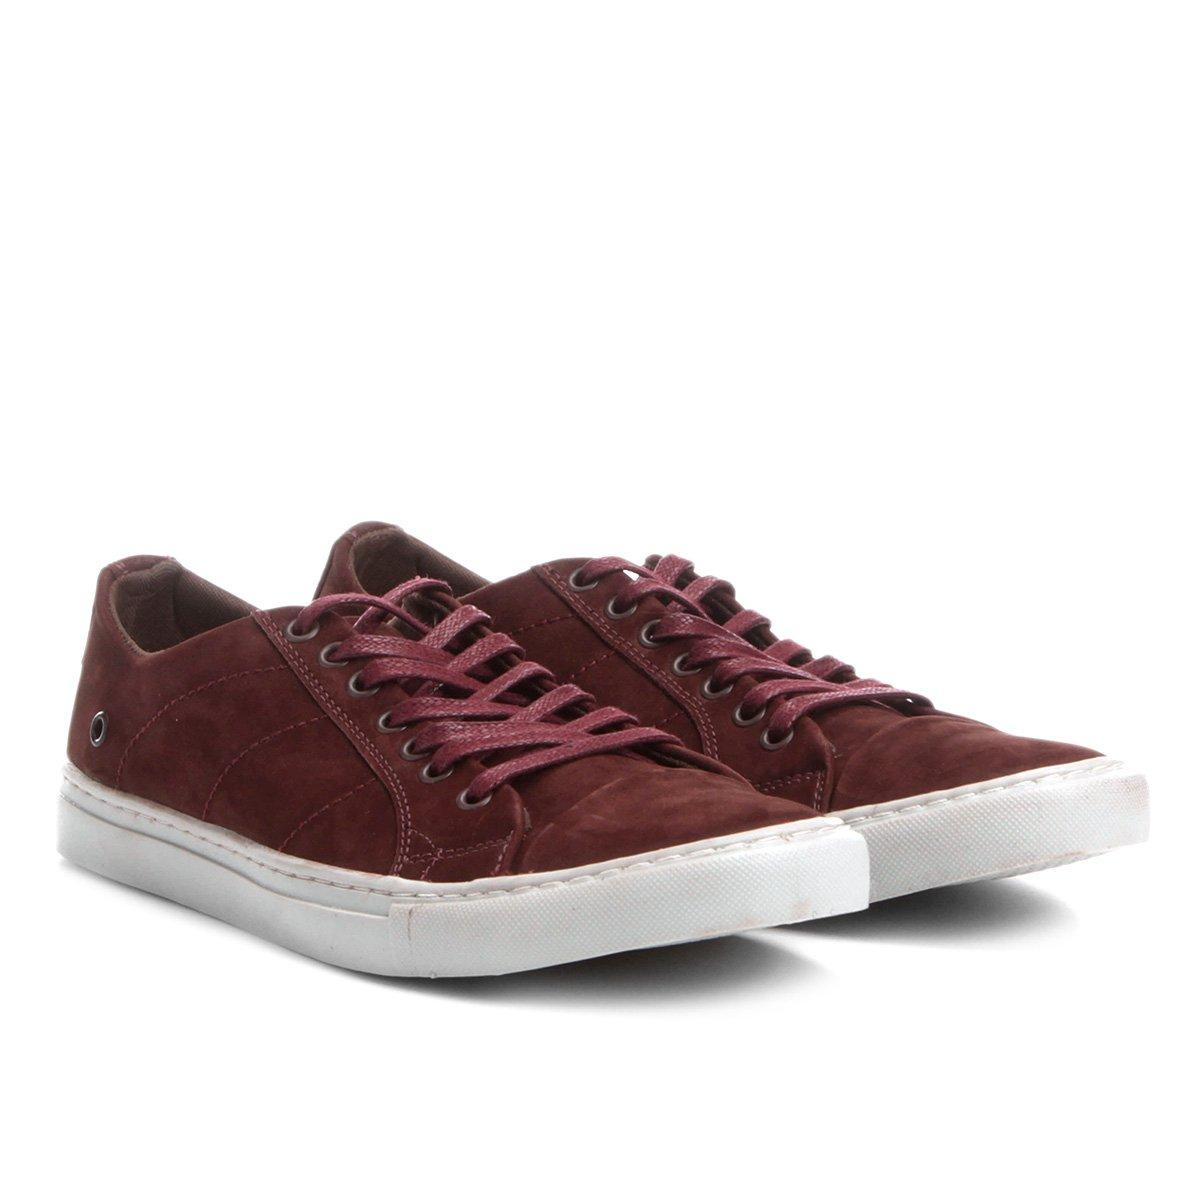 809c5b1073 Sapatênis Couro Shoestock Nobuck Color Masculino